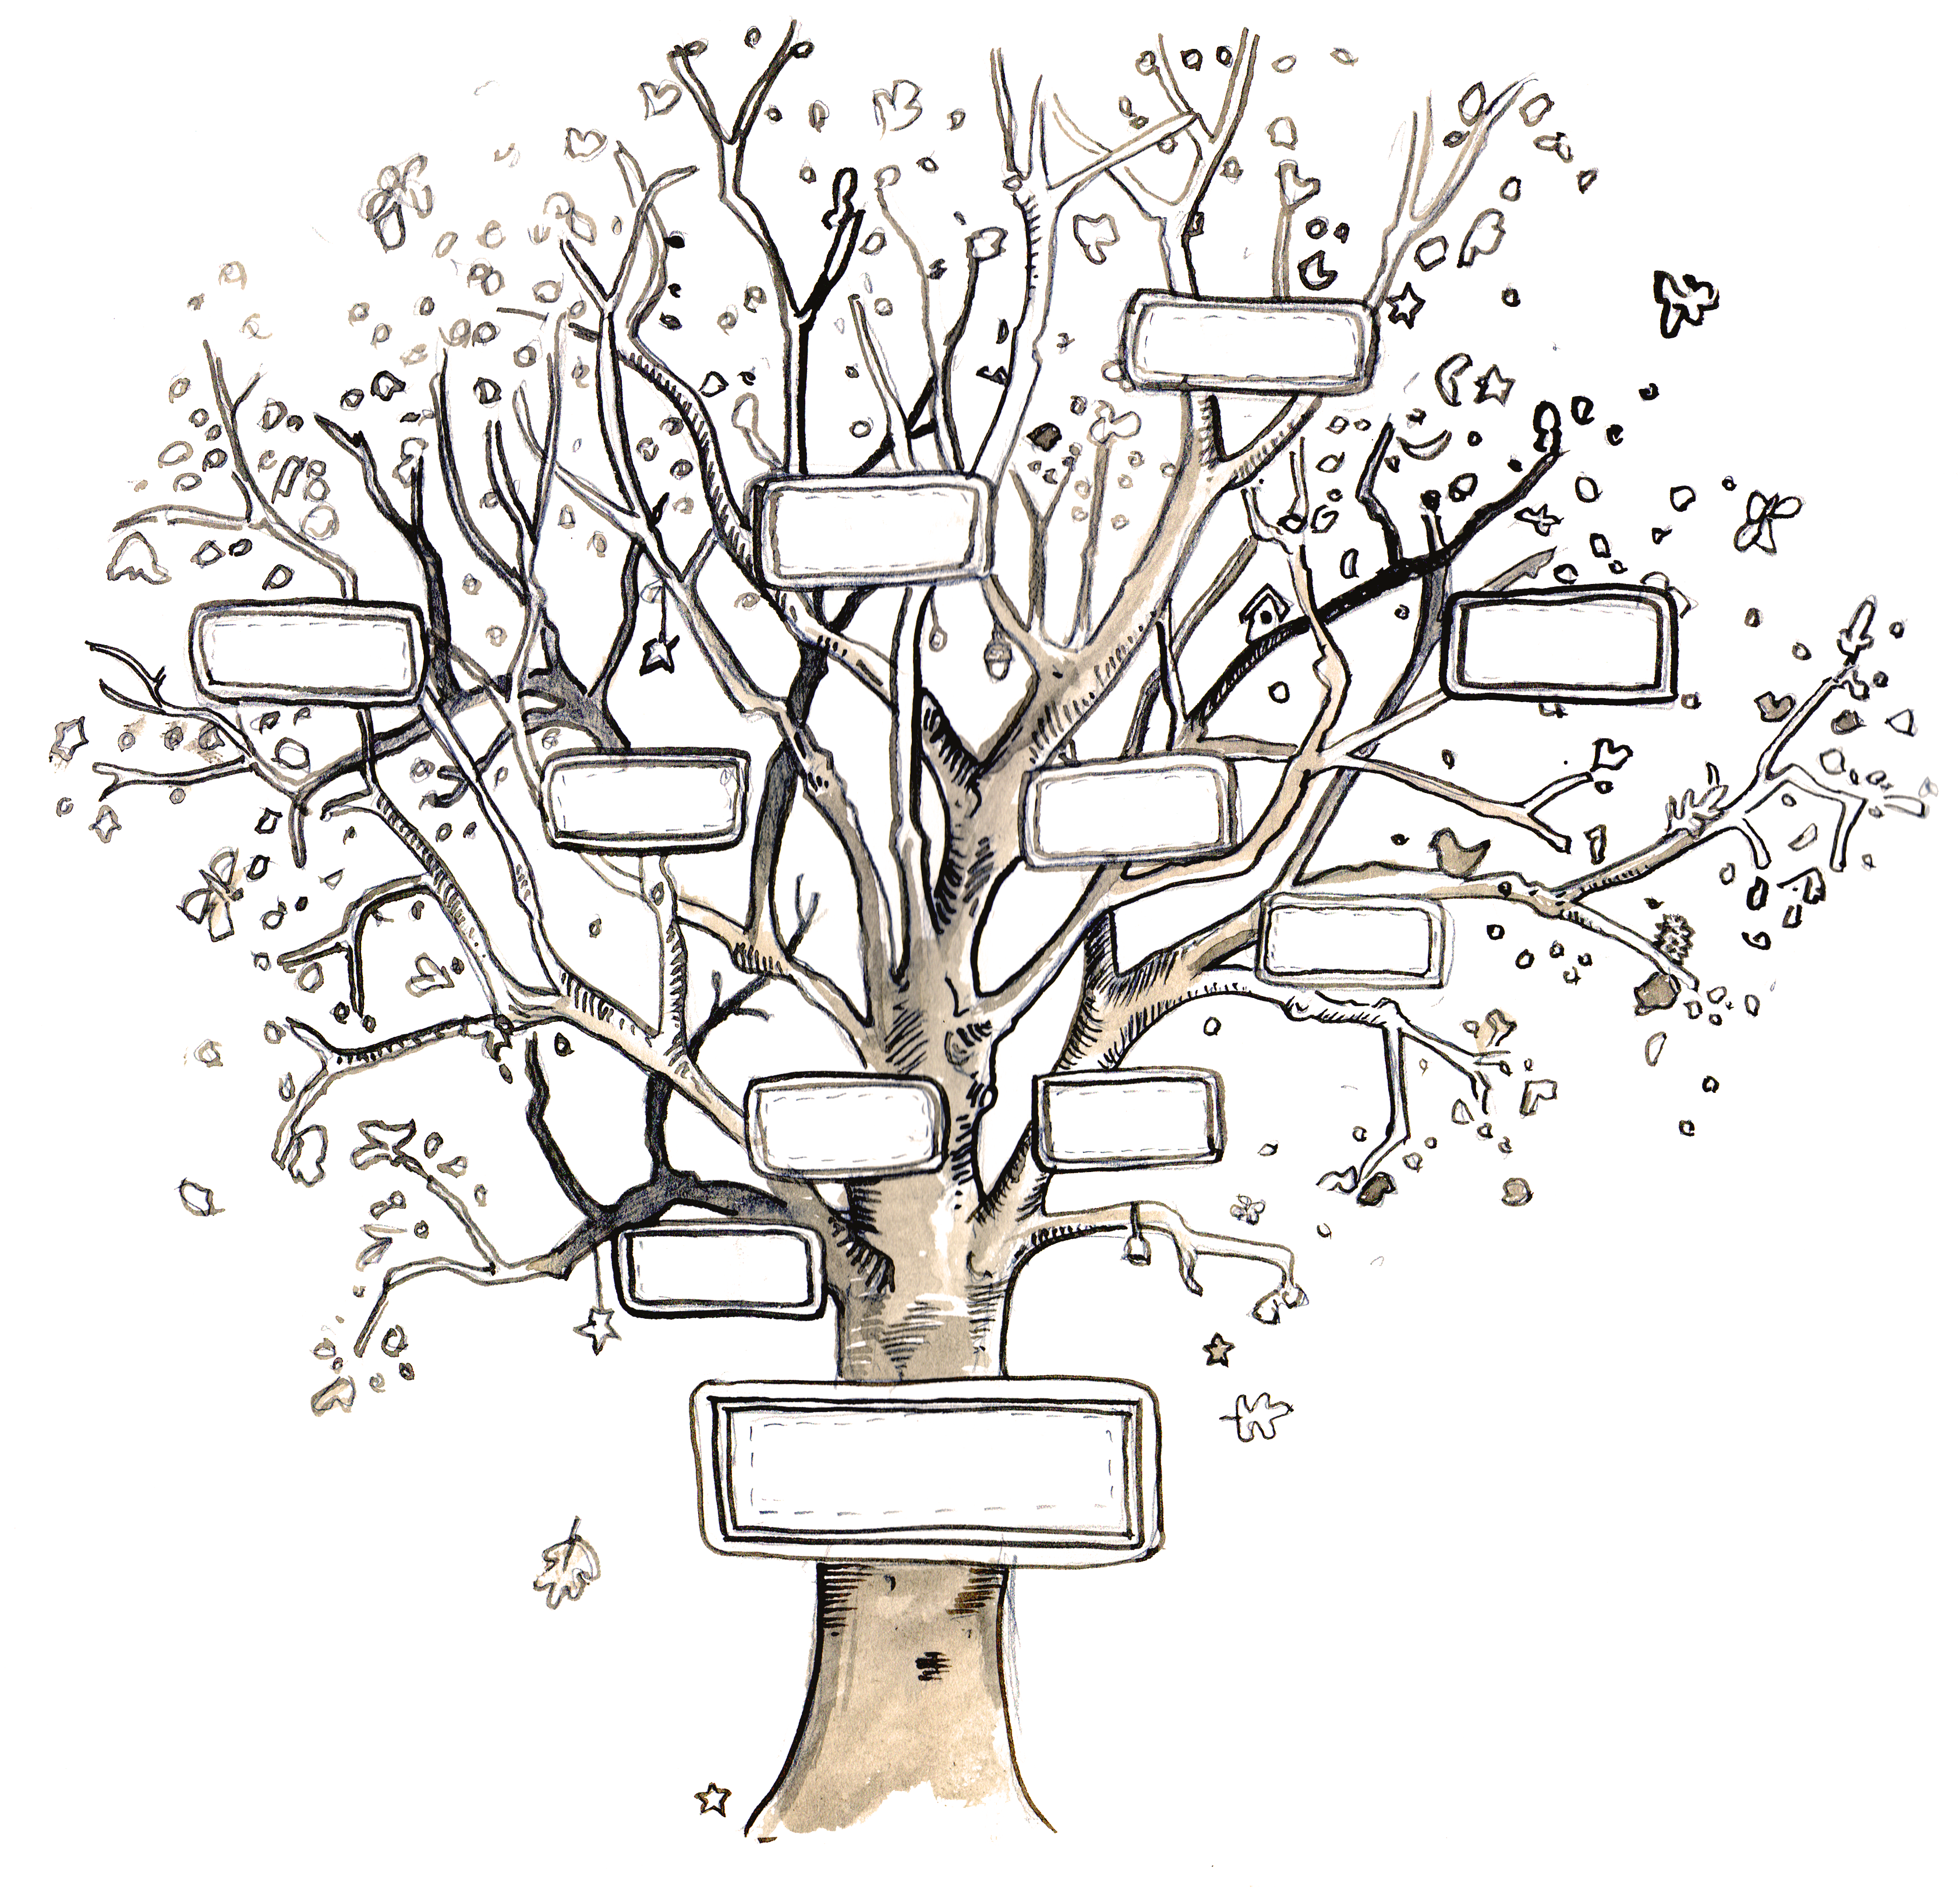 FamilyTreeBlank  Family    Family Trees Family Tree